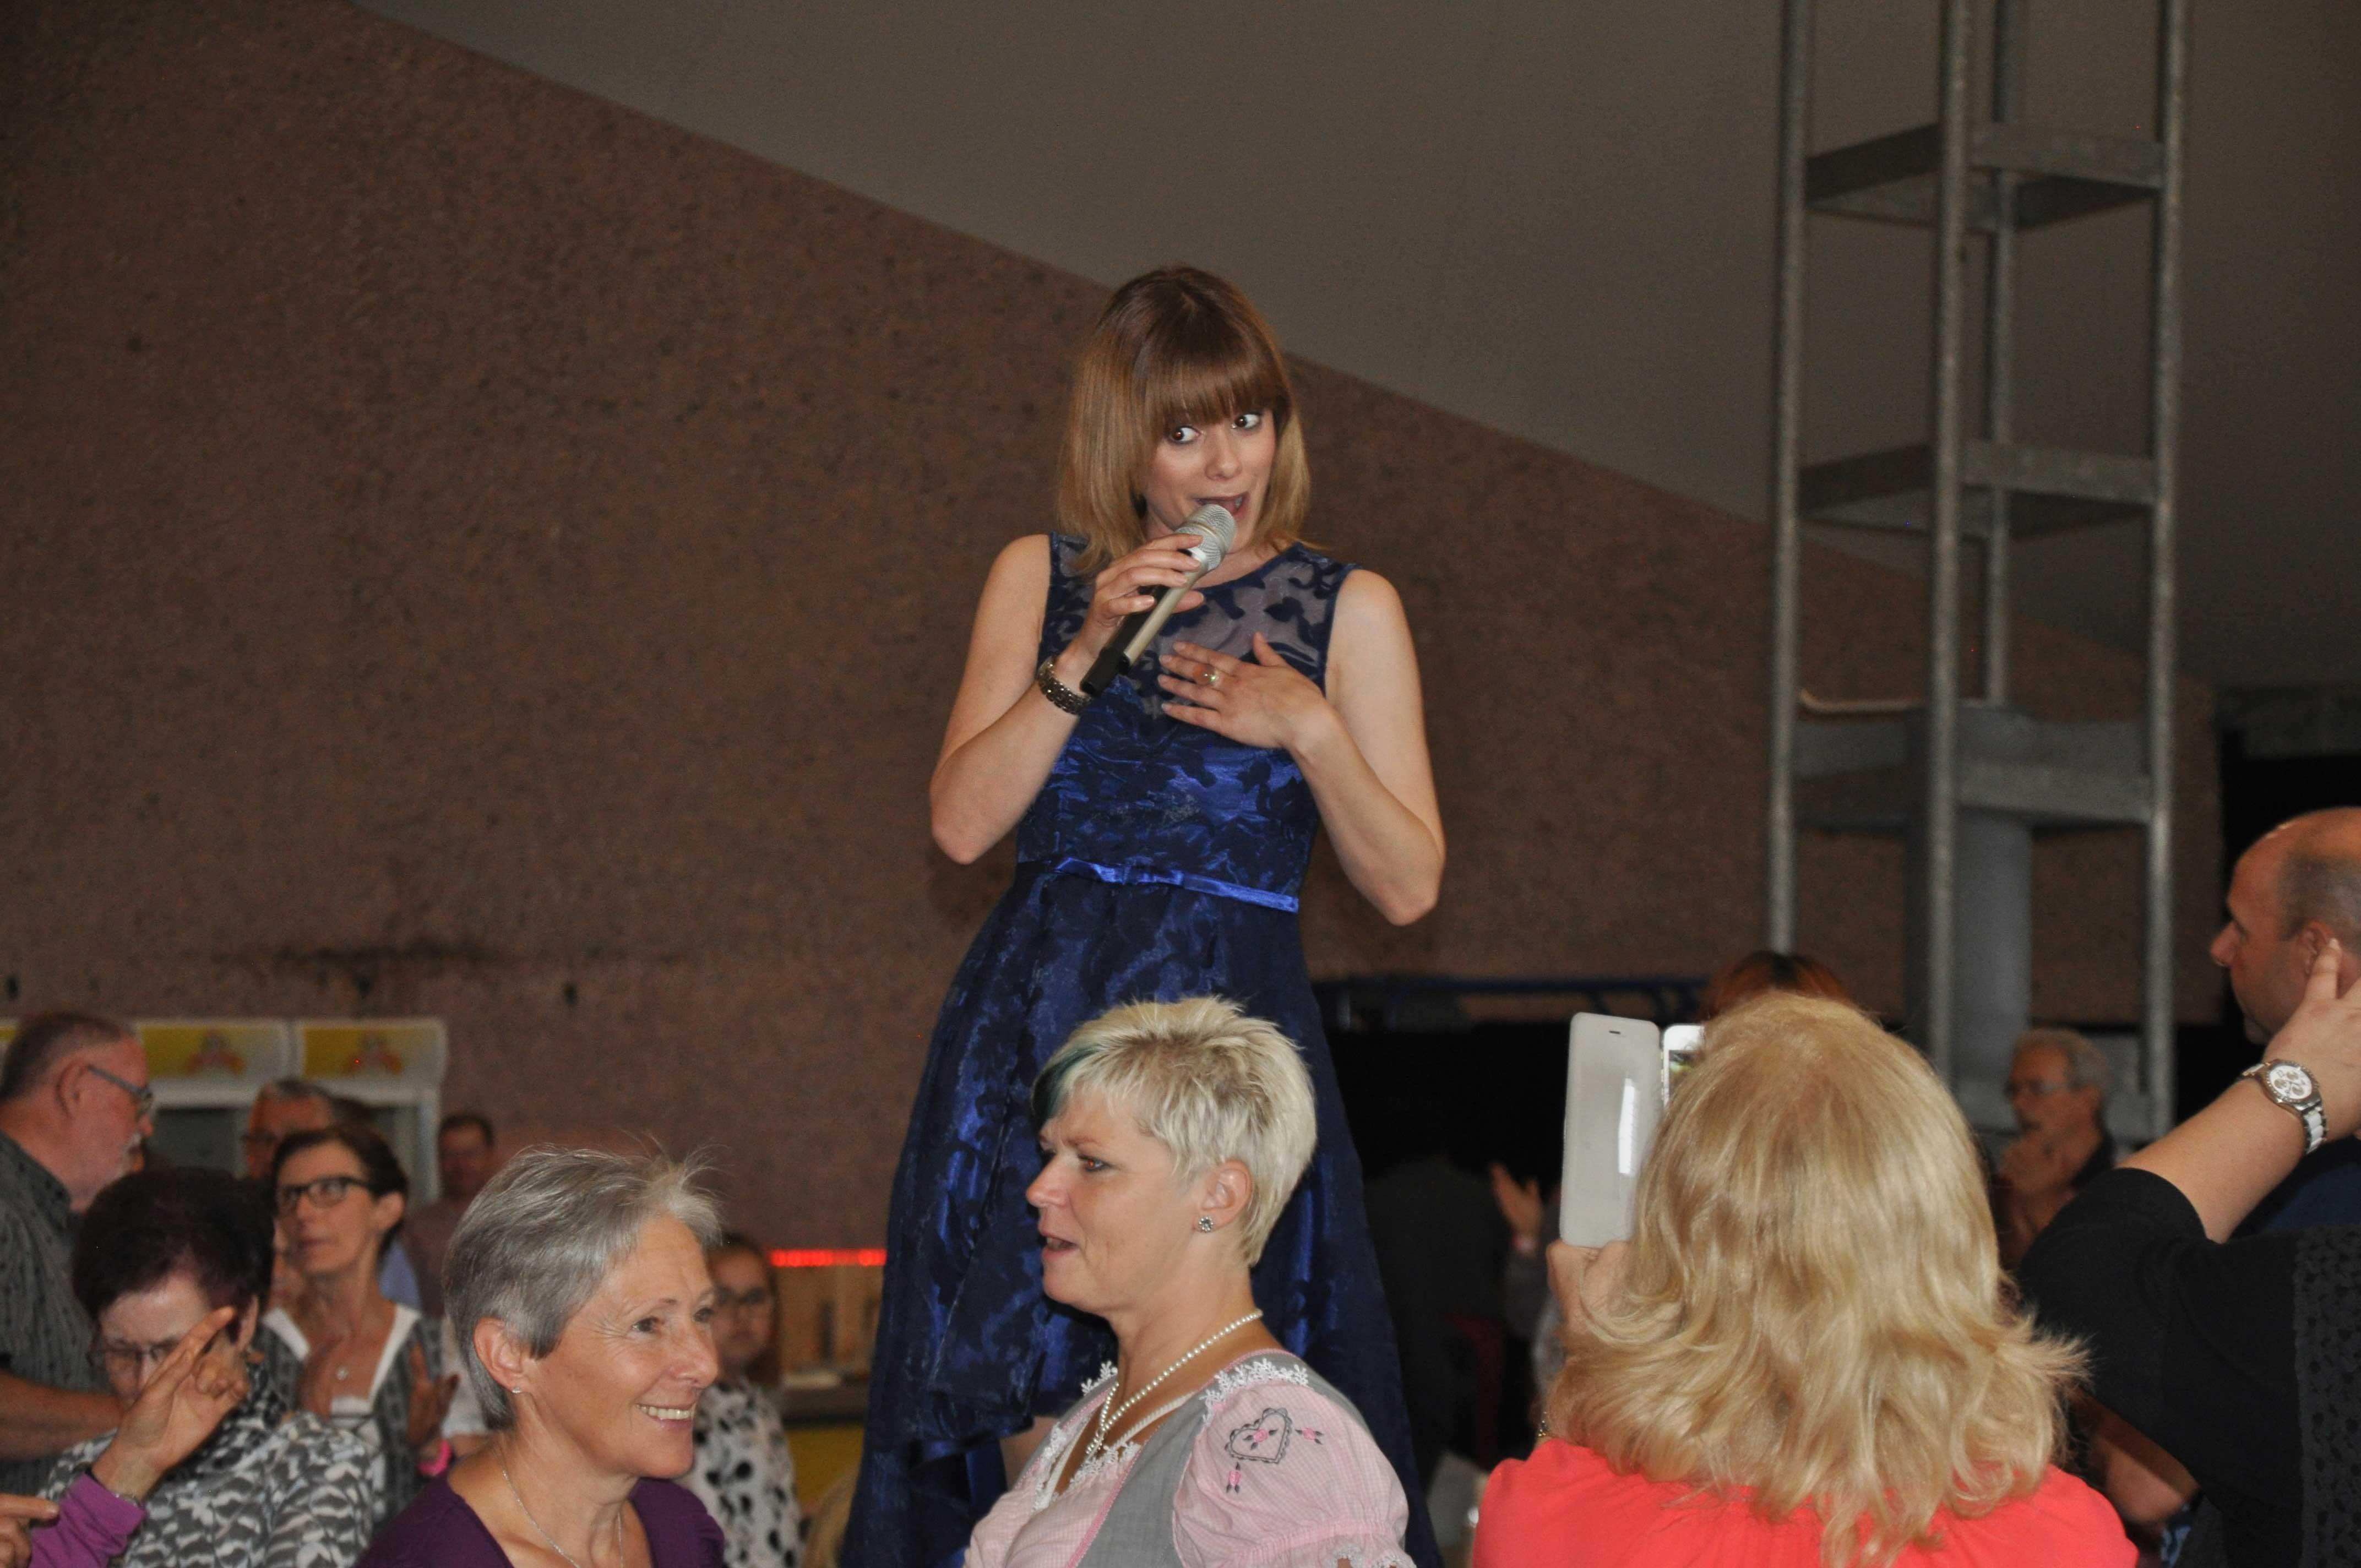 Senioren-Muttertag: Auftritt Francine Jordi